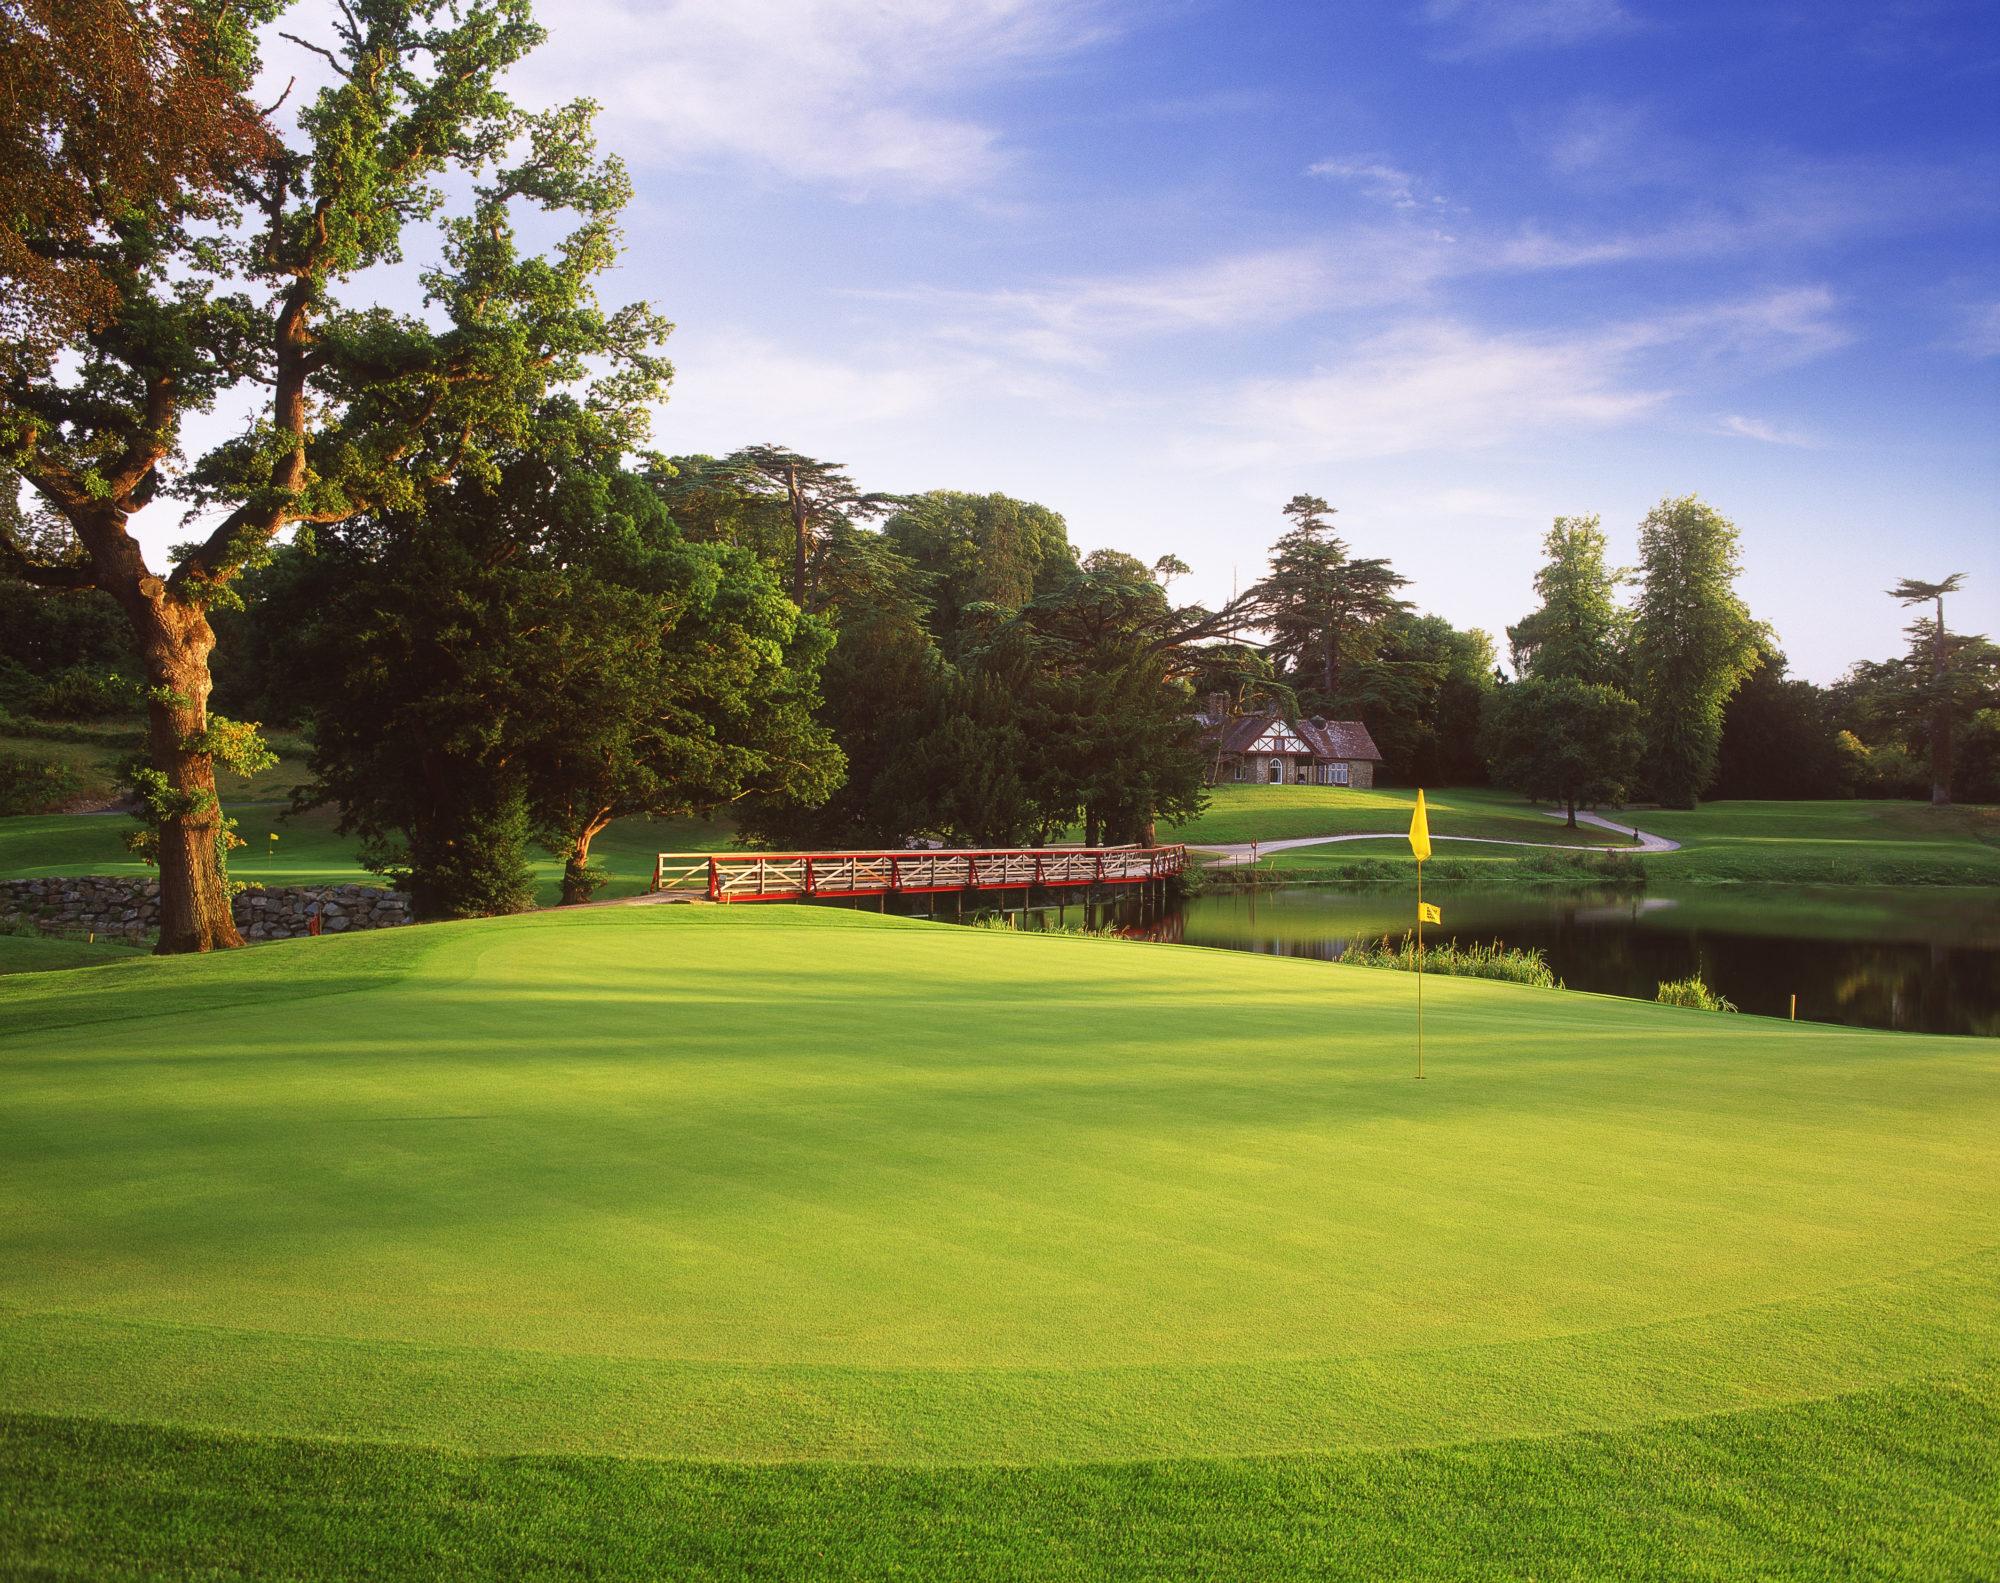 OMeara parkland golfcourse at Carton House – copy right Carton House-jpg